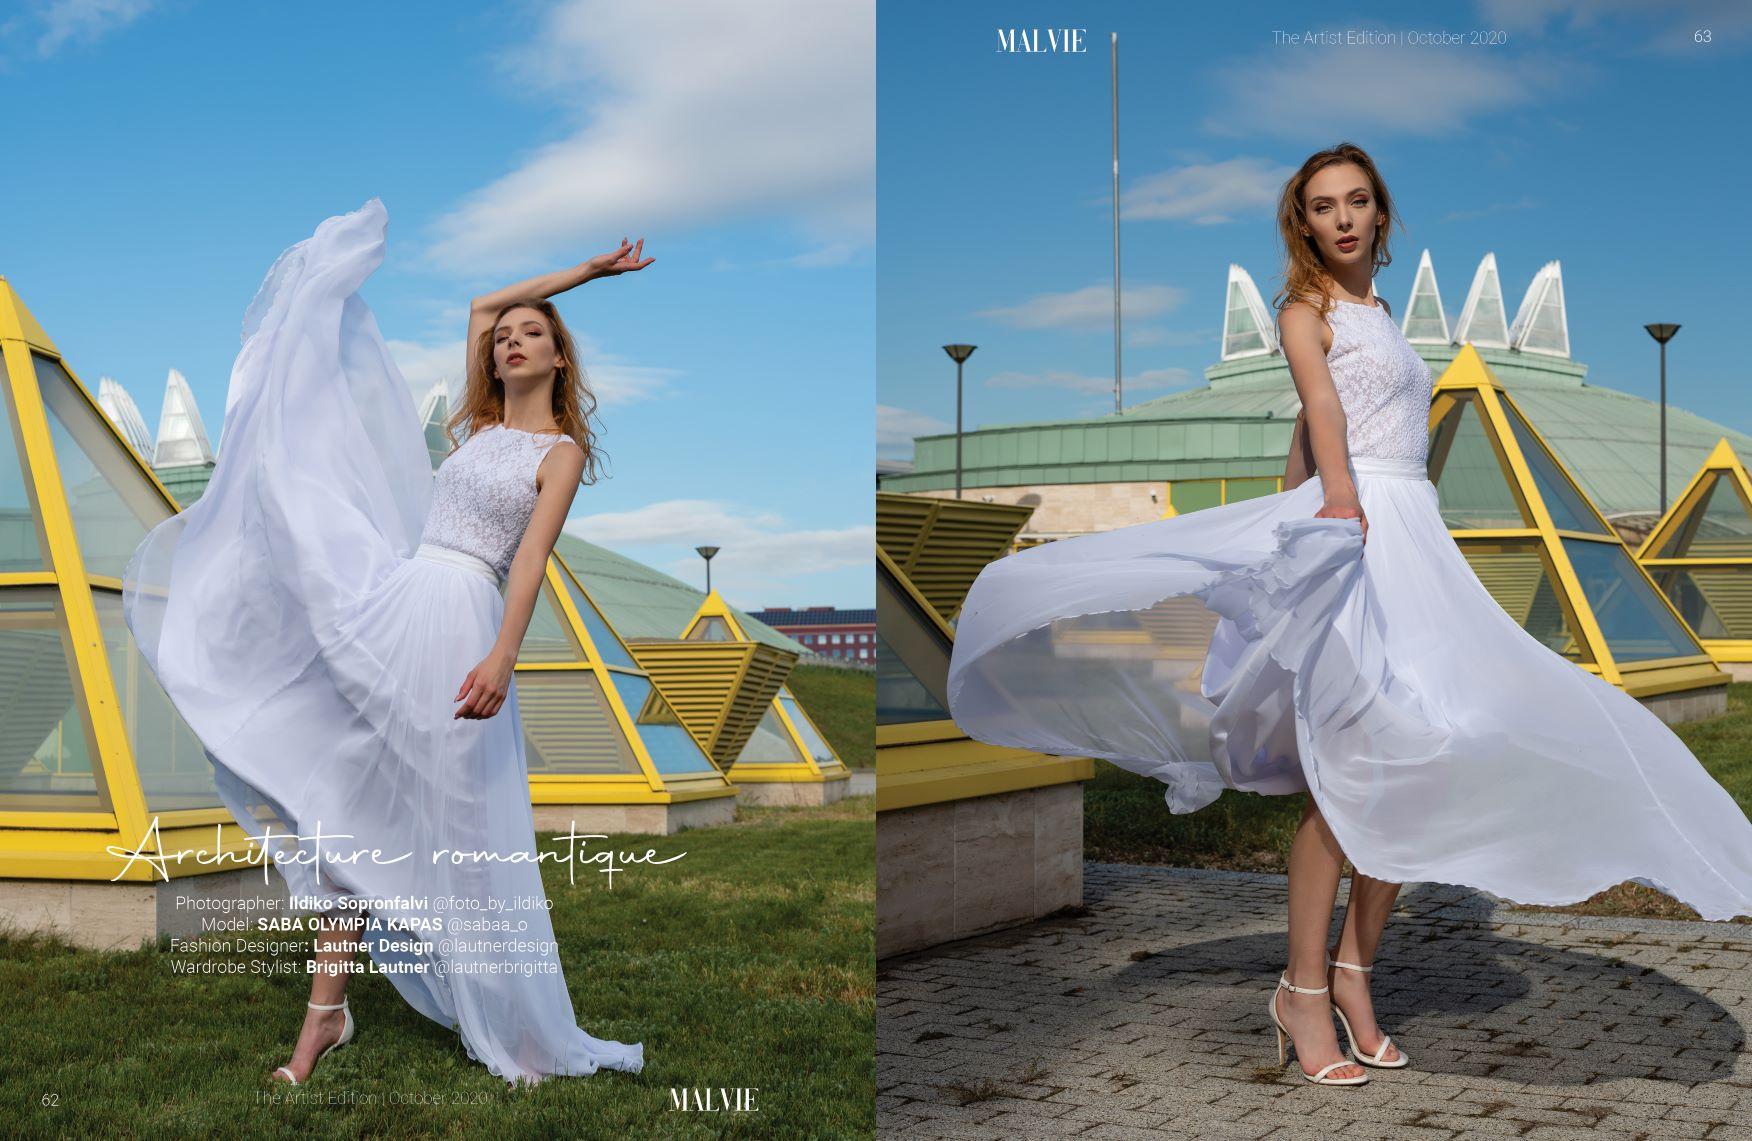 MALVIE Mag The Artist Edition Vol 37 October 2020 spreads32